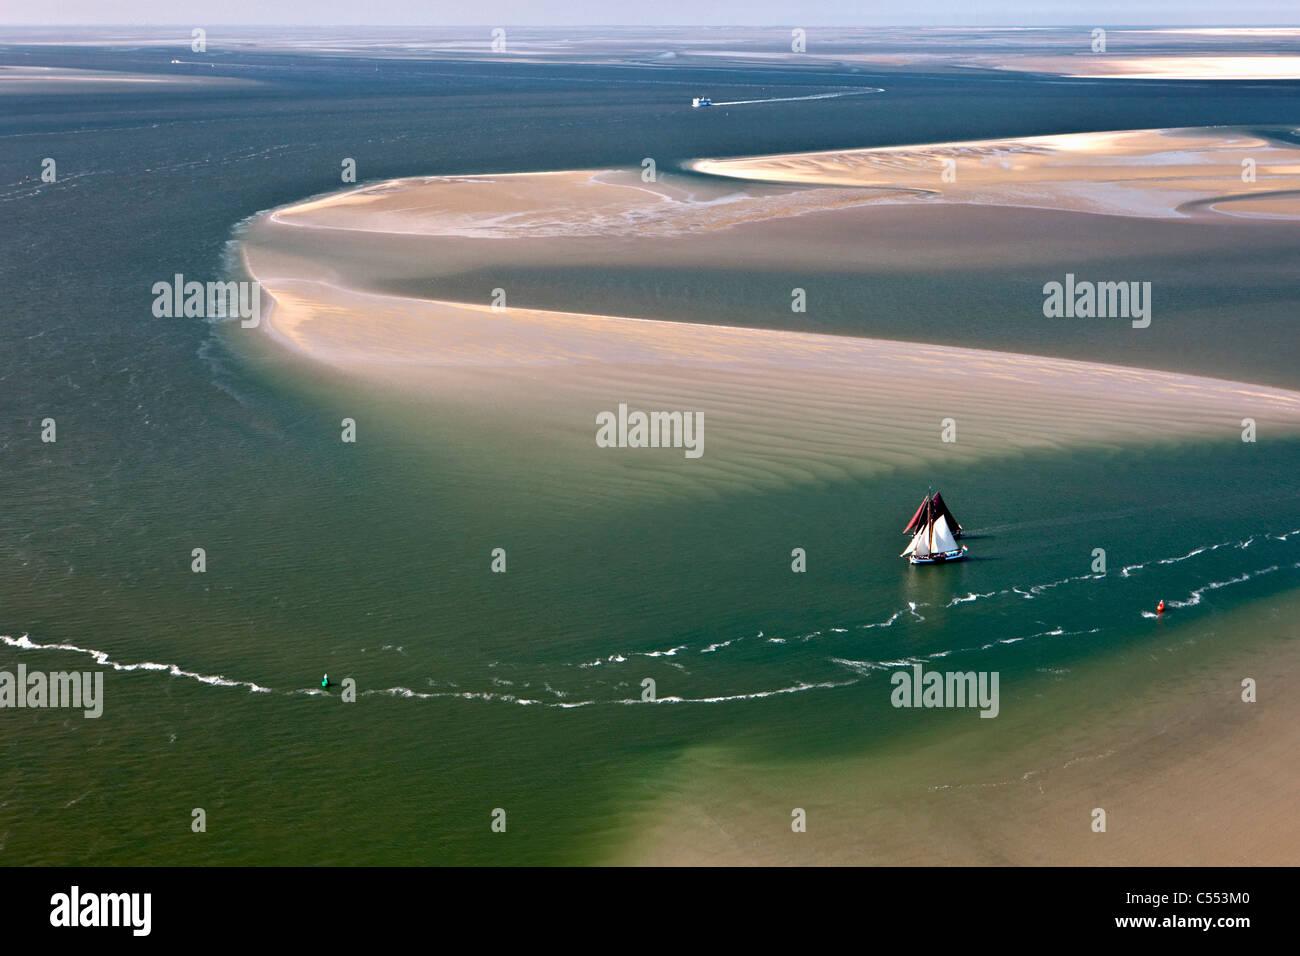 Holland, Insel Terschelling, Wattenmeer. UNESCO-Weltkulturerbe. Luft. Herkömmliche Frachtschiffe Segeln Kreuzfahrten Stockbild